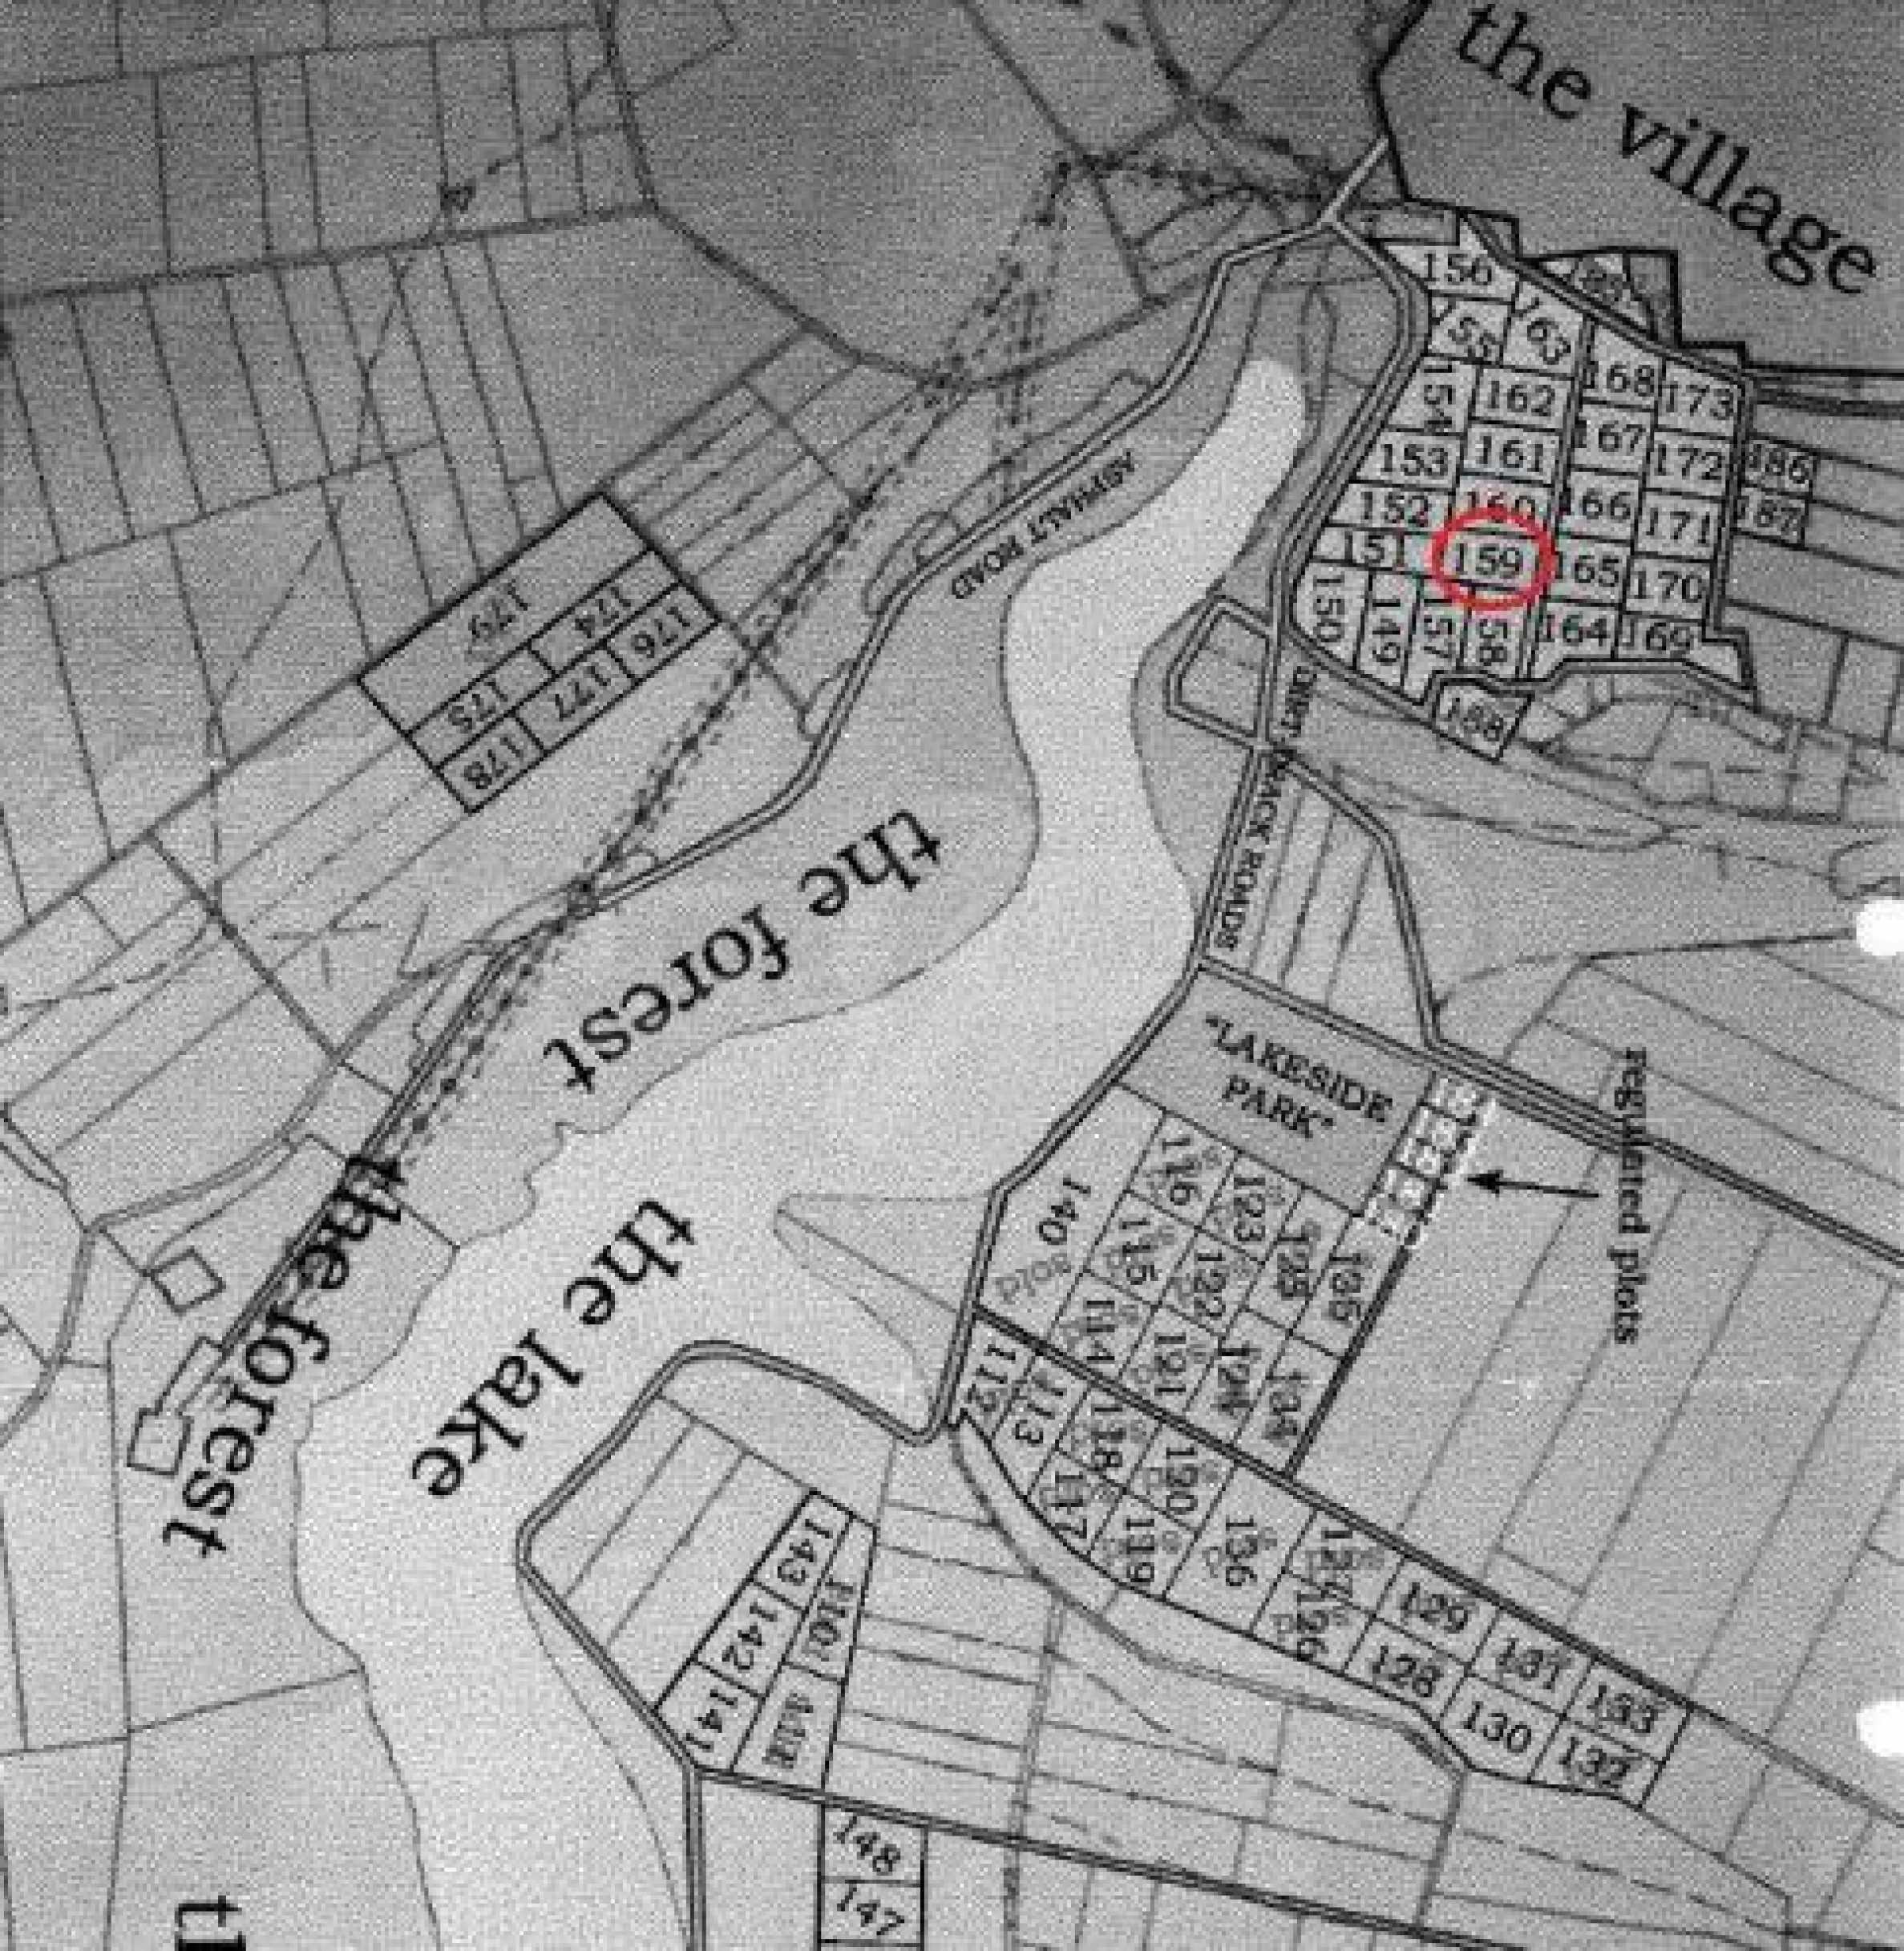 A plot in Nikolaevka 6